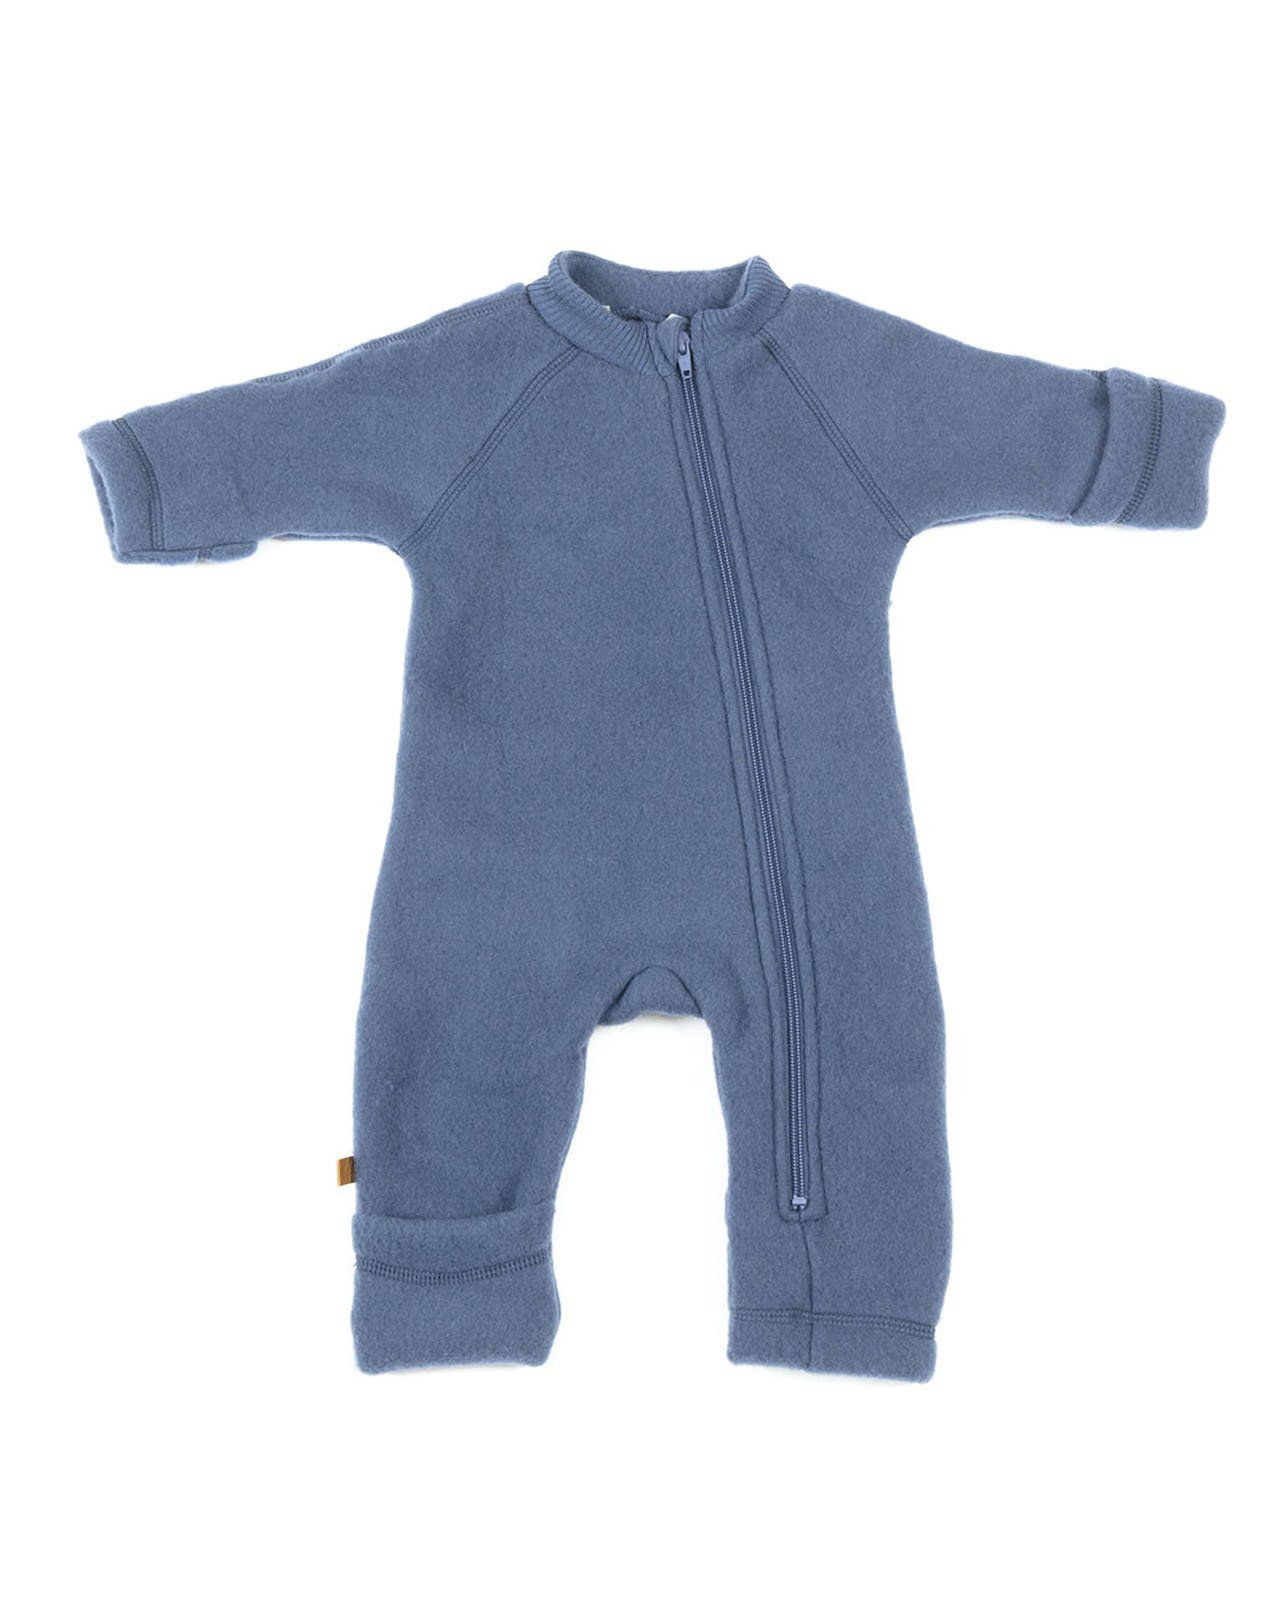 Image of   jumpsuit fra Smallstuff i merino uld med lynlås - Denim